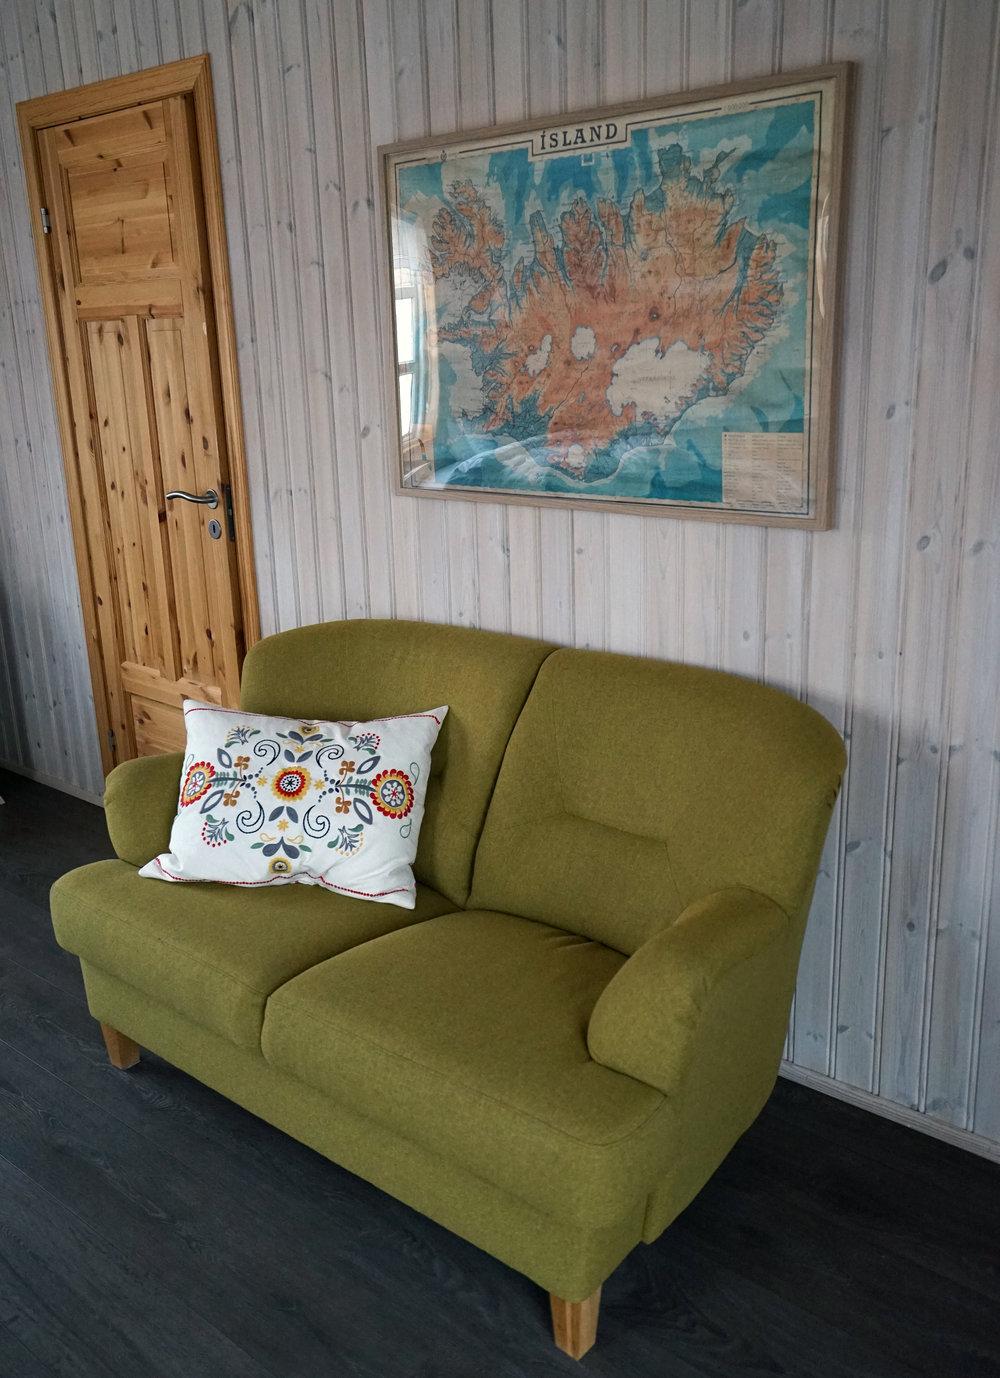 klængshóll-cabin-couch.jpg